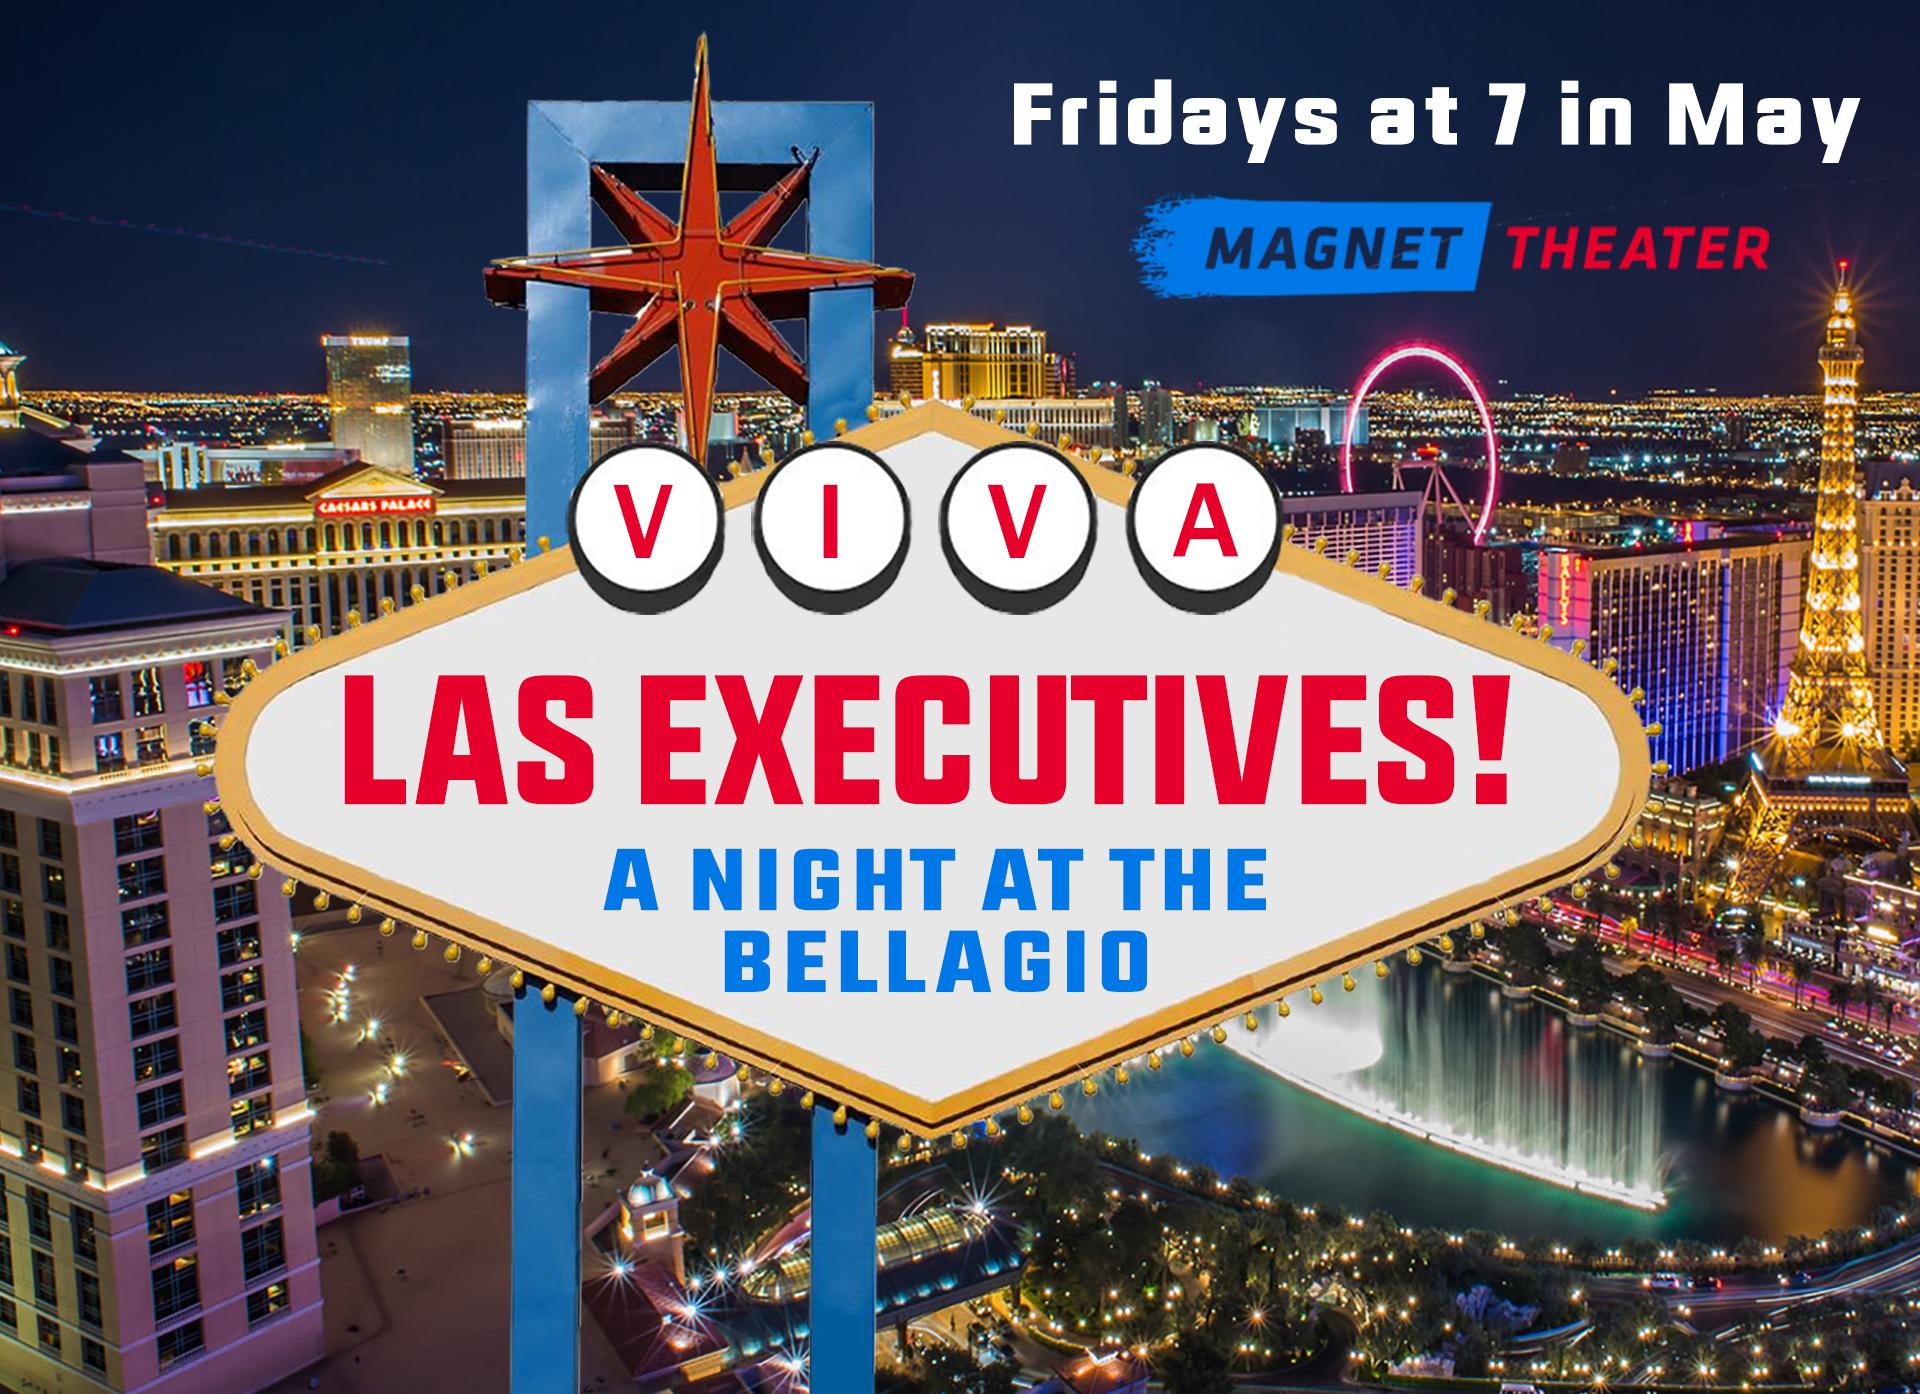 Viva Las Executives: A Night at the Bellagio